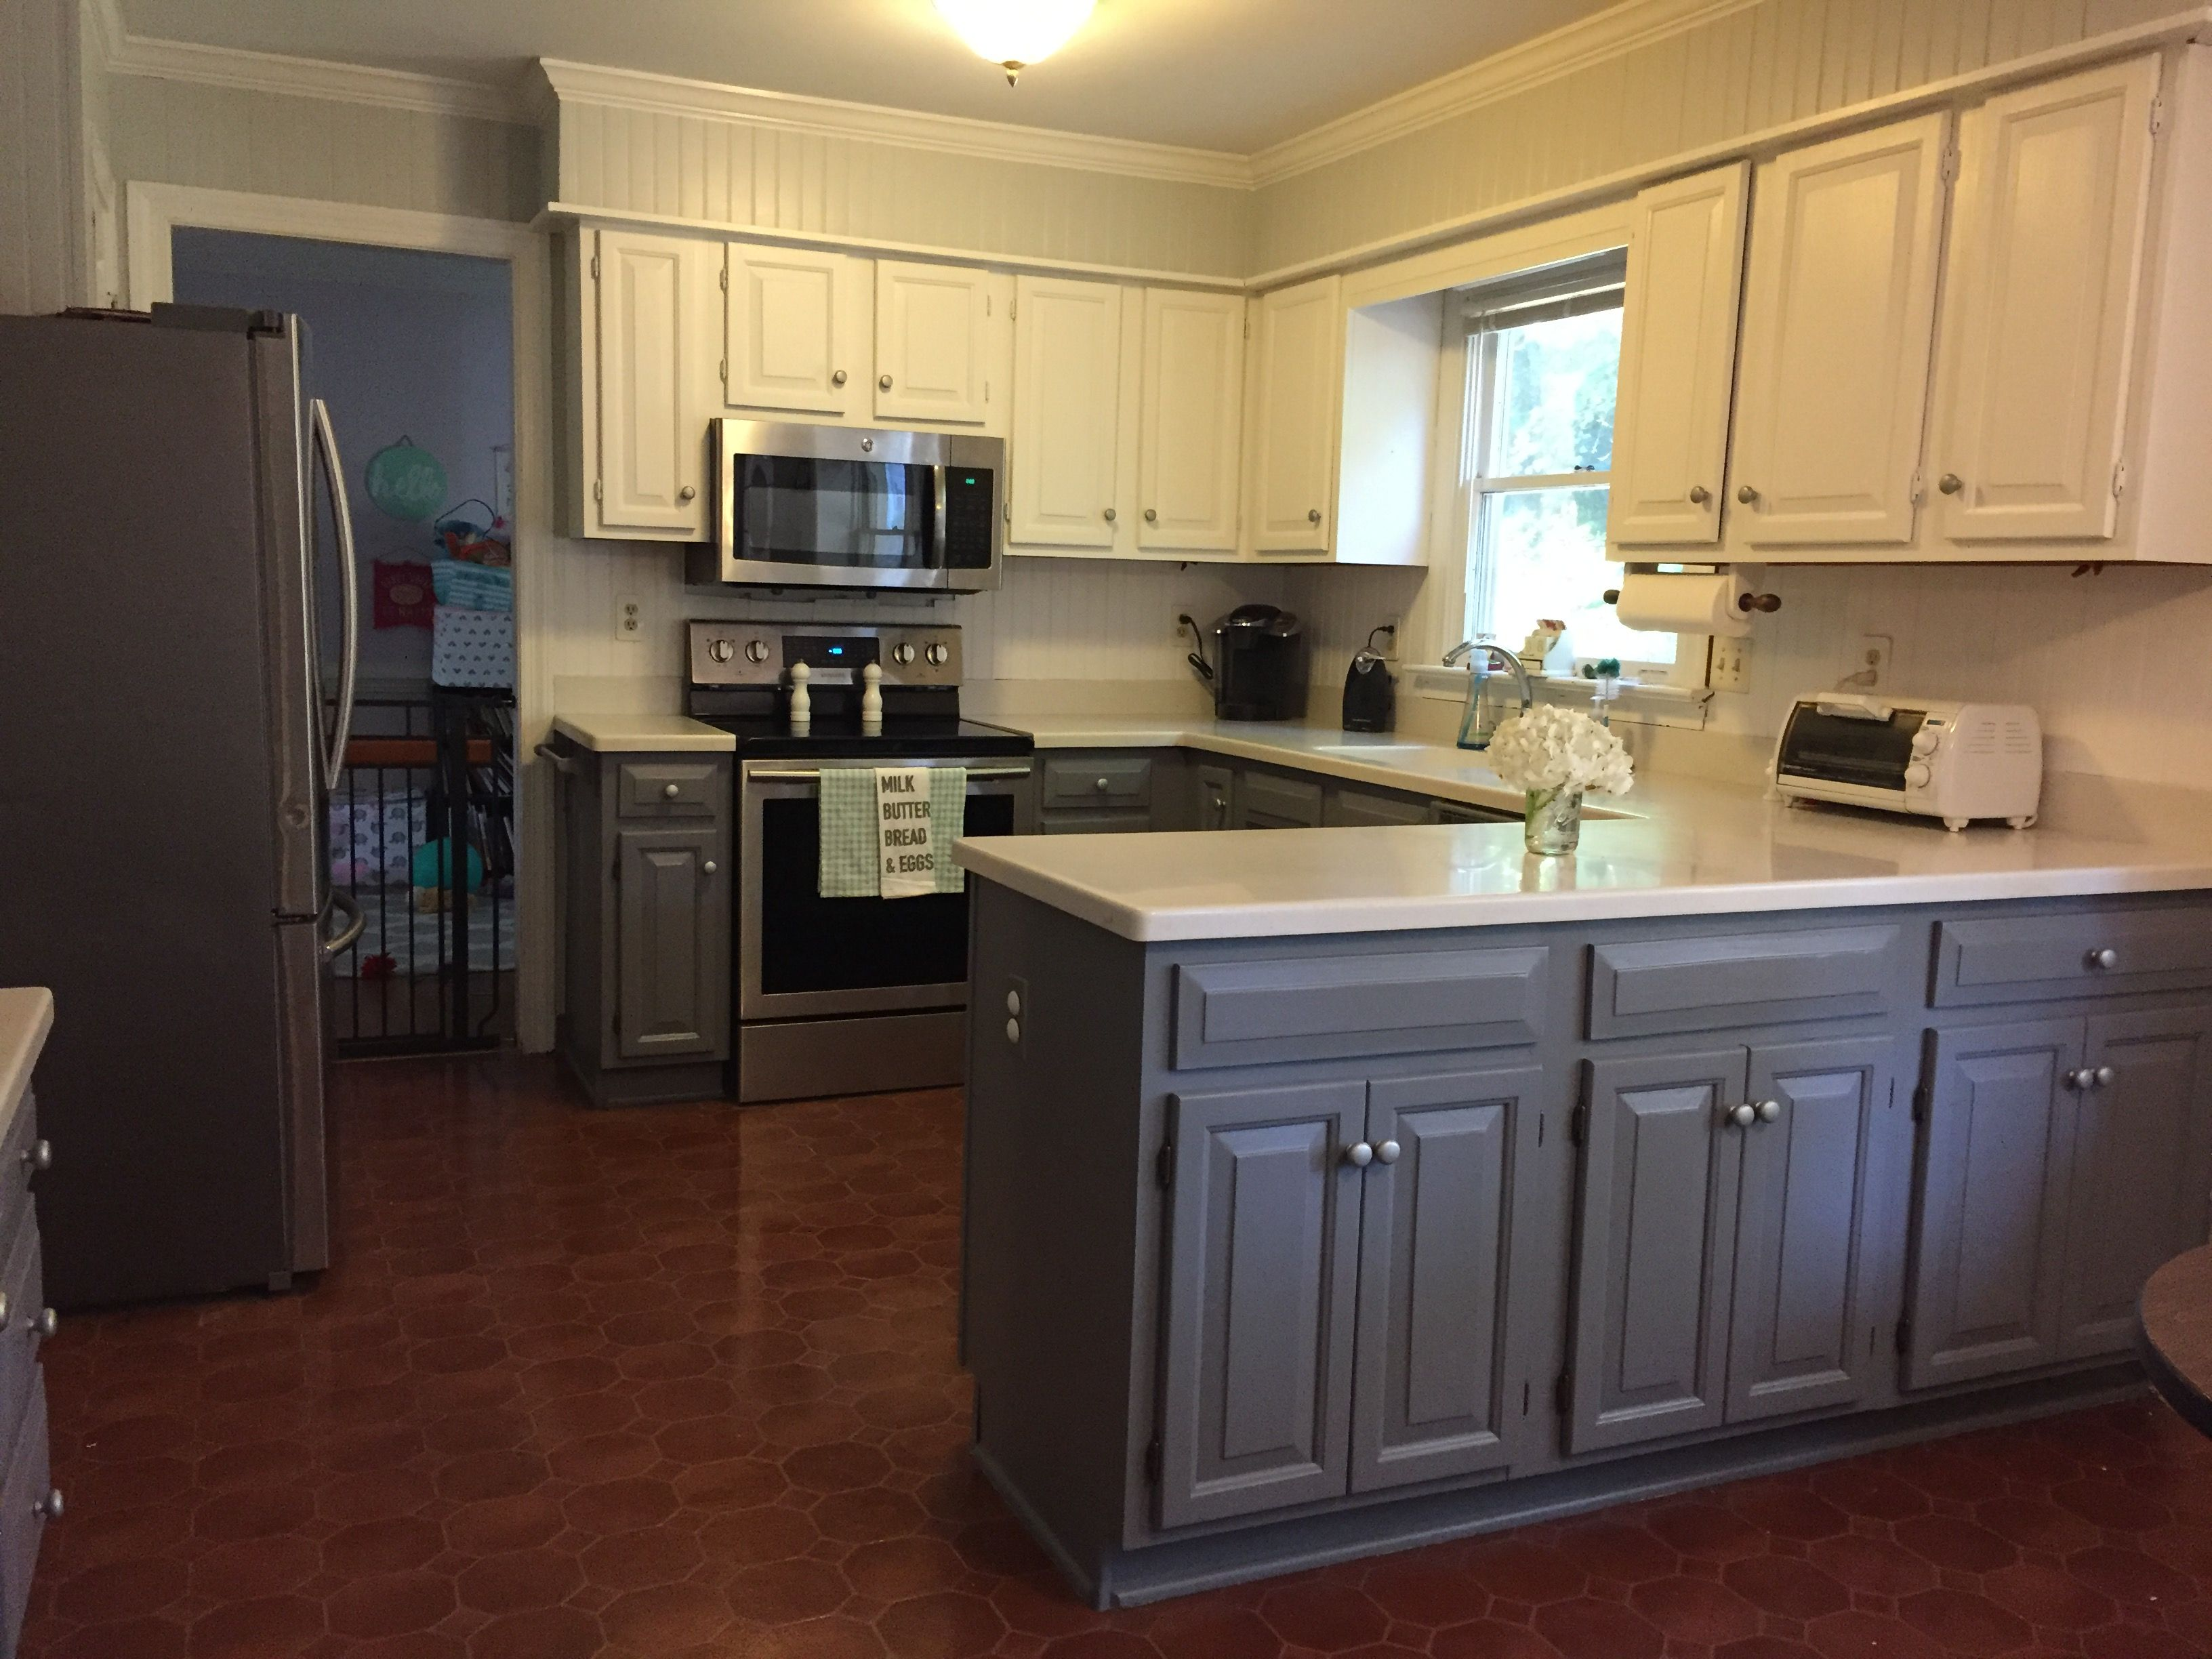 Best Dual Tone Cabinets Tuxedo Cabinets Diy Kitchen Upgrade 400 x 300